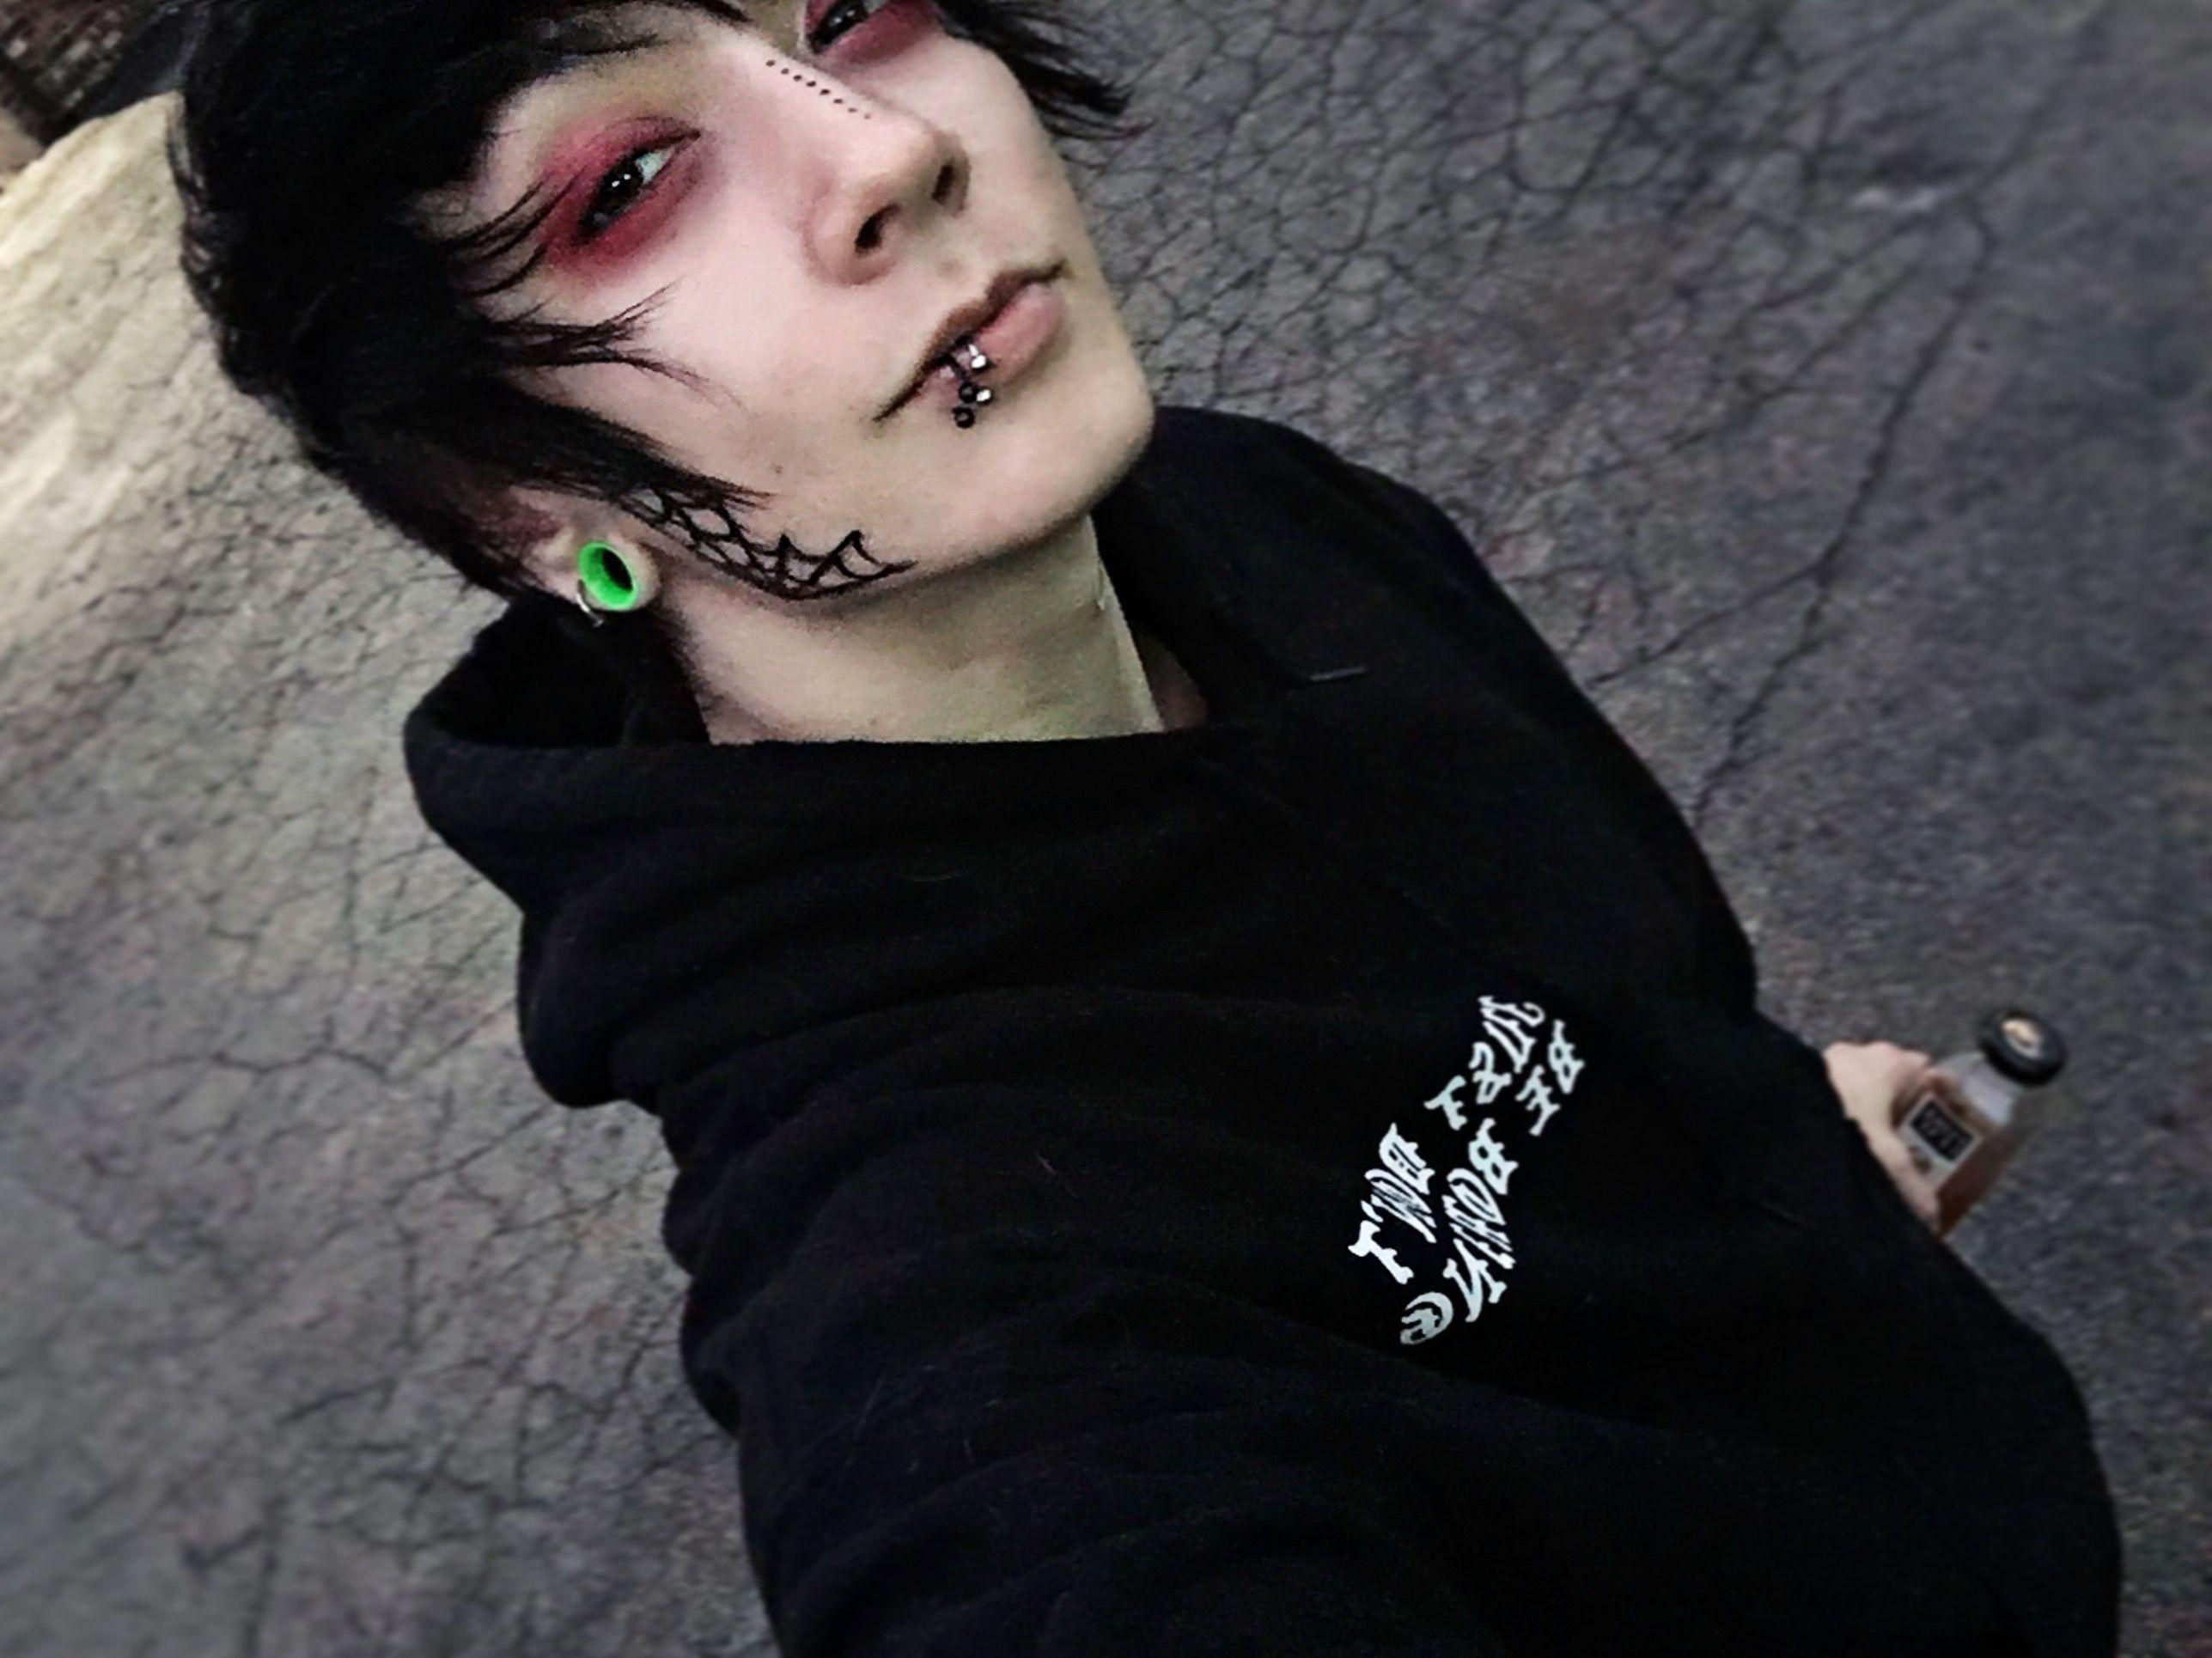 Red eyeshadow black clothes spiderweb tattoo on my jawline my